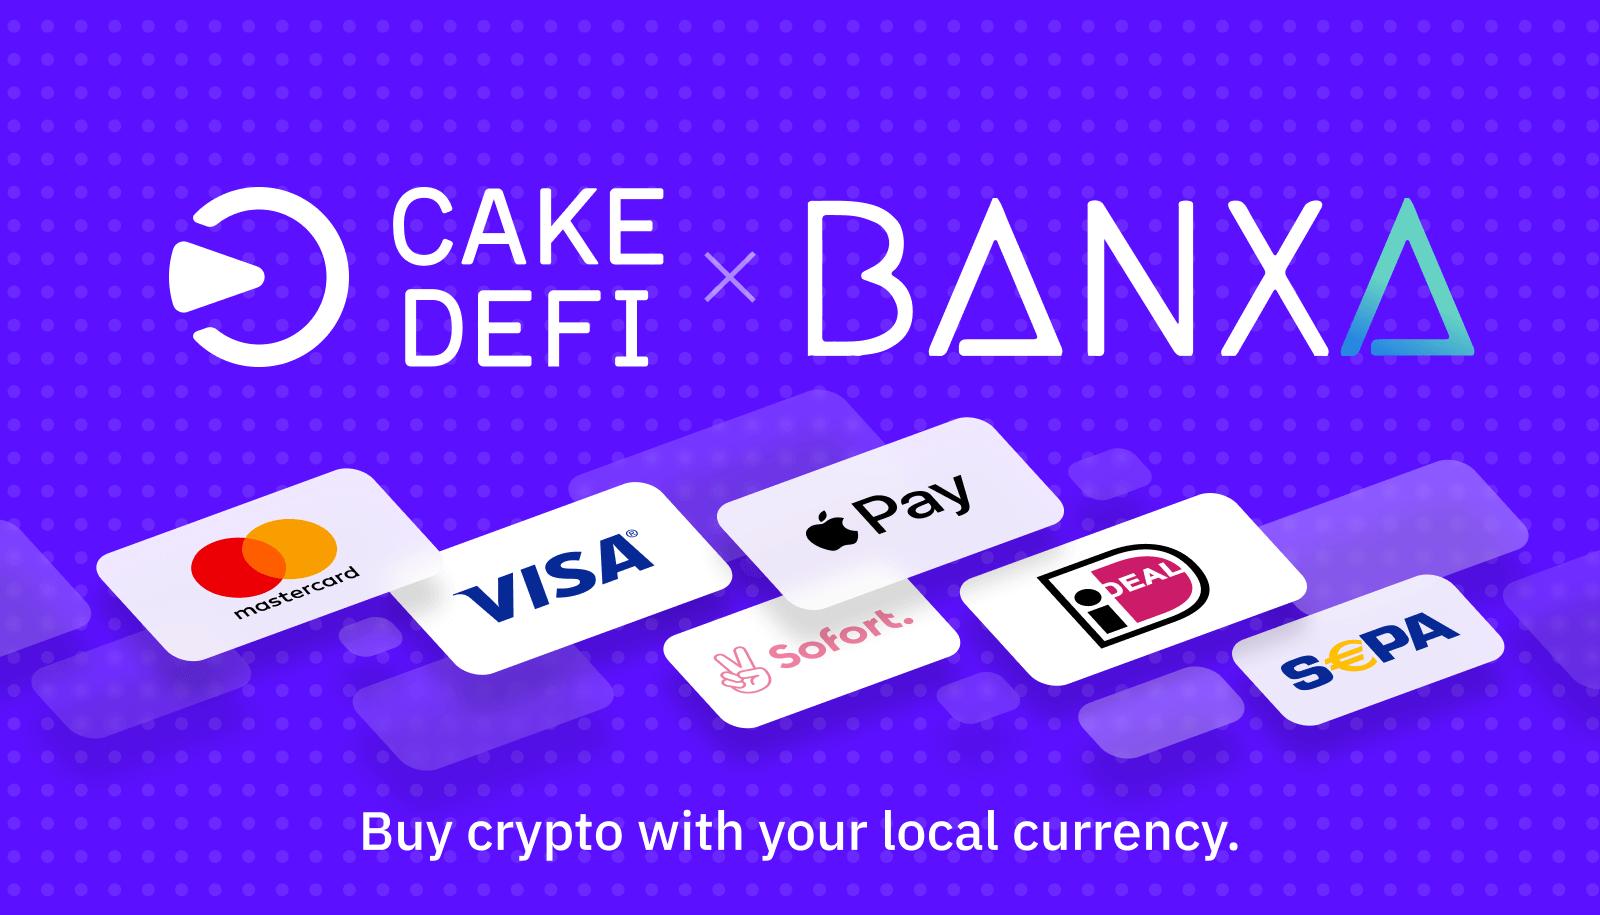 acquista bitcoin bezahlen bitcoin kurs sek